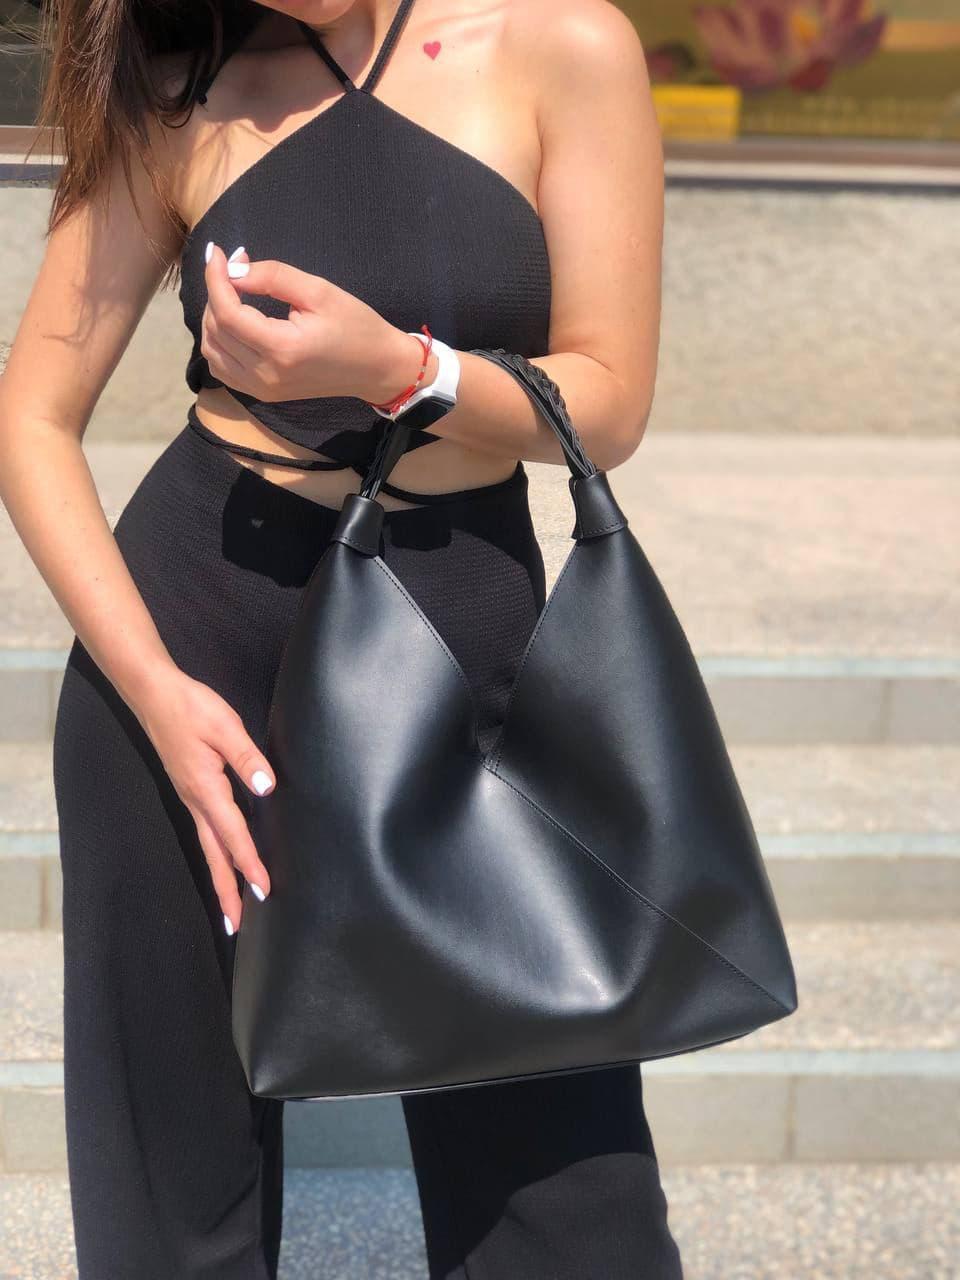 Жіноча чорна велика сумка-мішок трапеція на одне плече крута добротна сумка-шоппер чорна